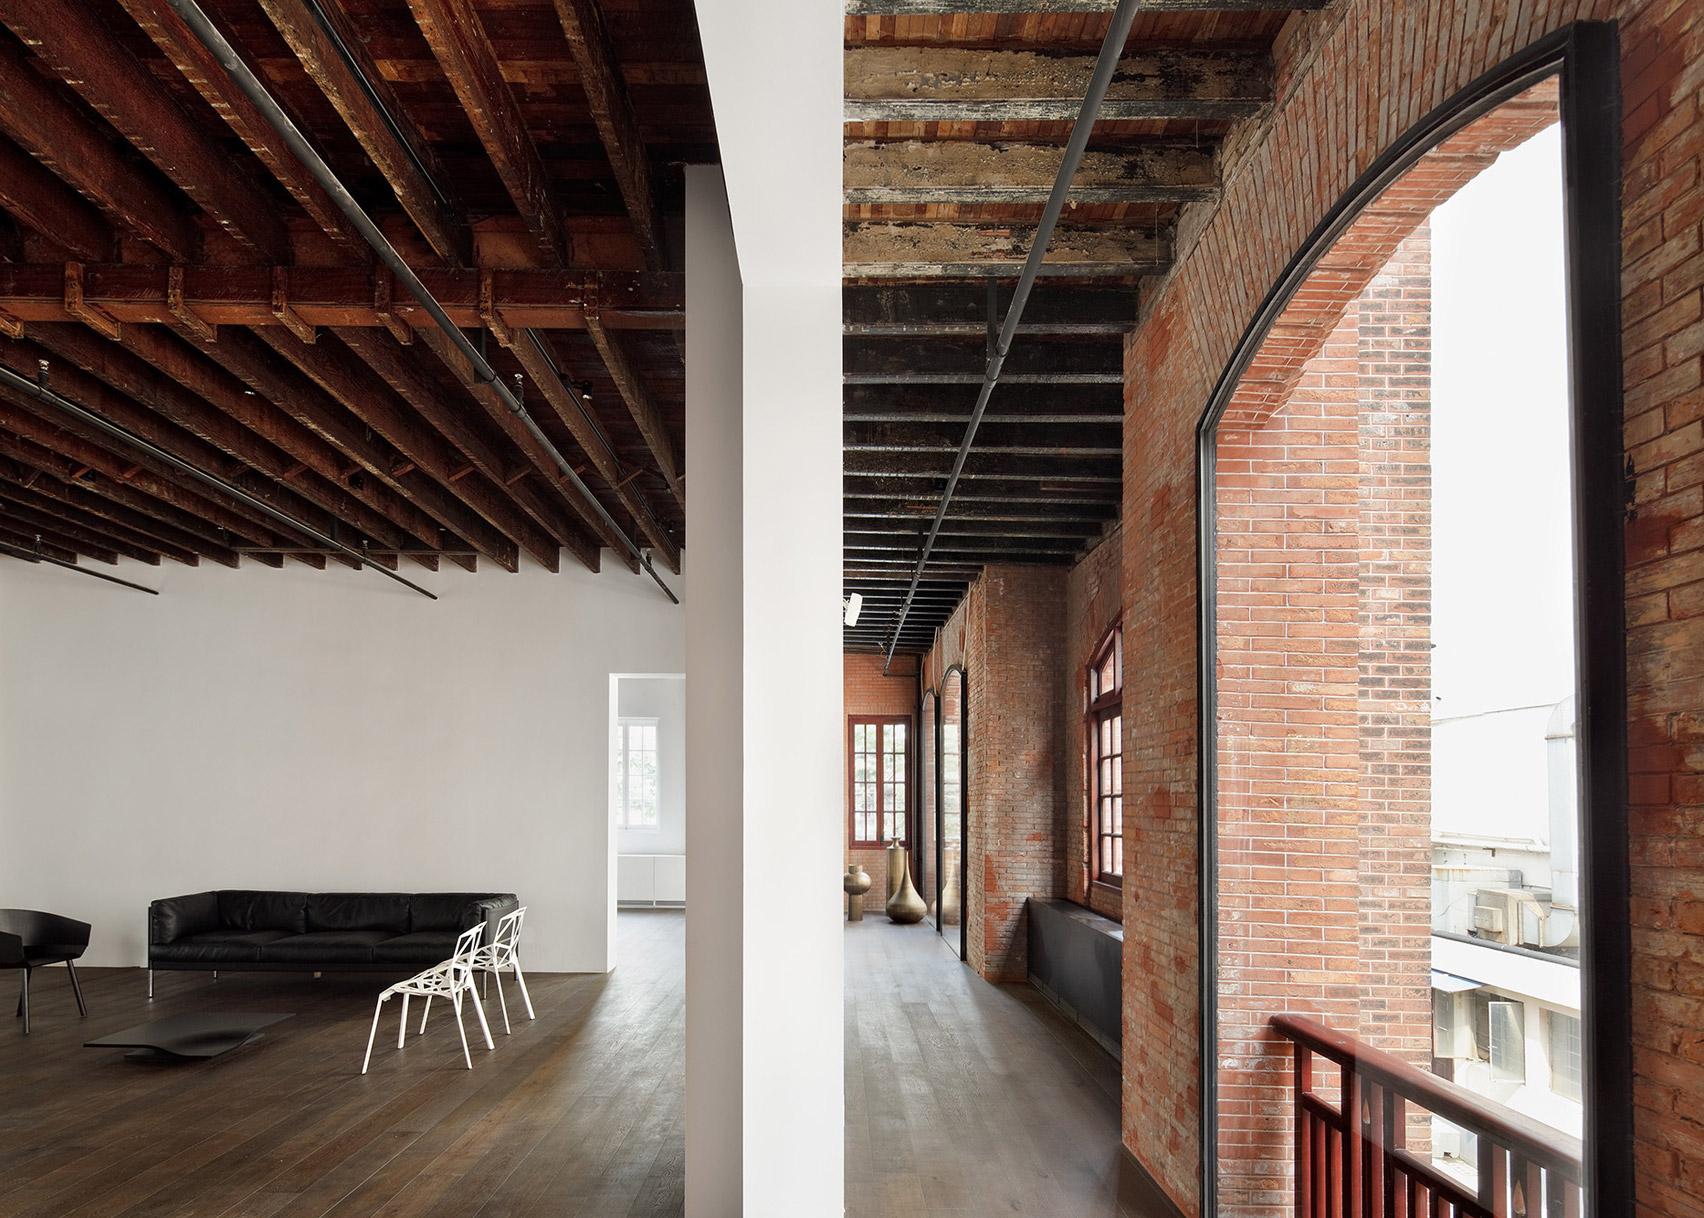 The Design Republic Commune by Neri&Hu on the top 10 brick interiors on Dezeen's Pinterest boards